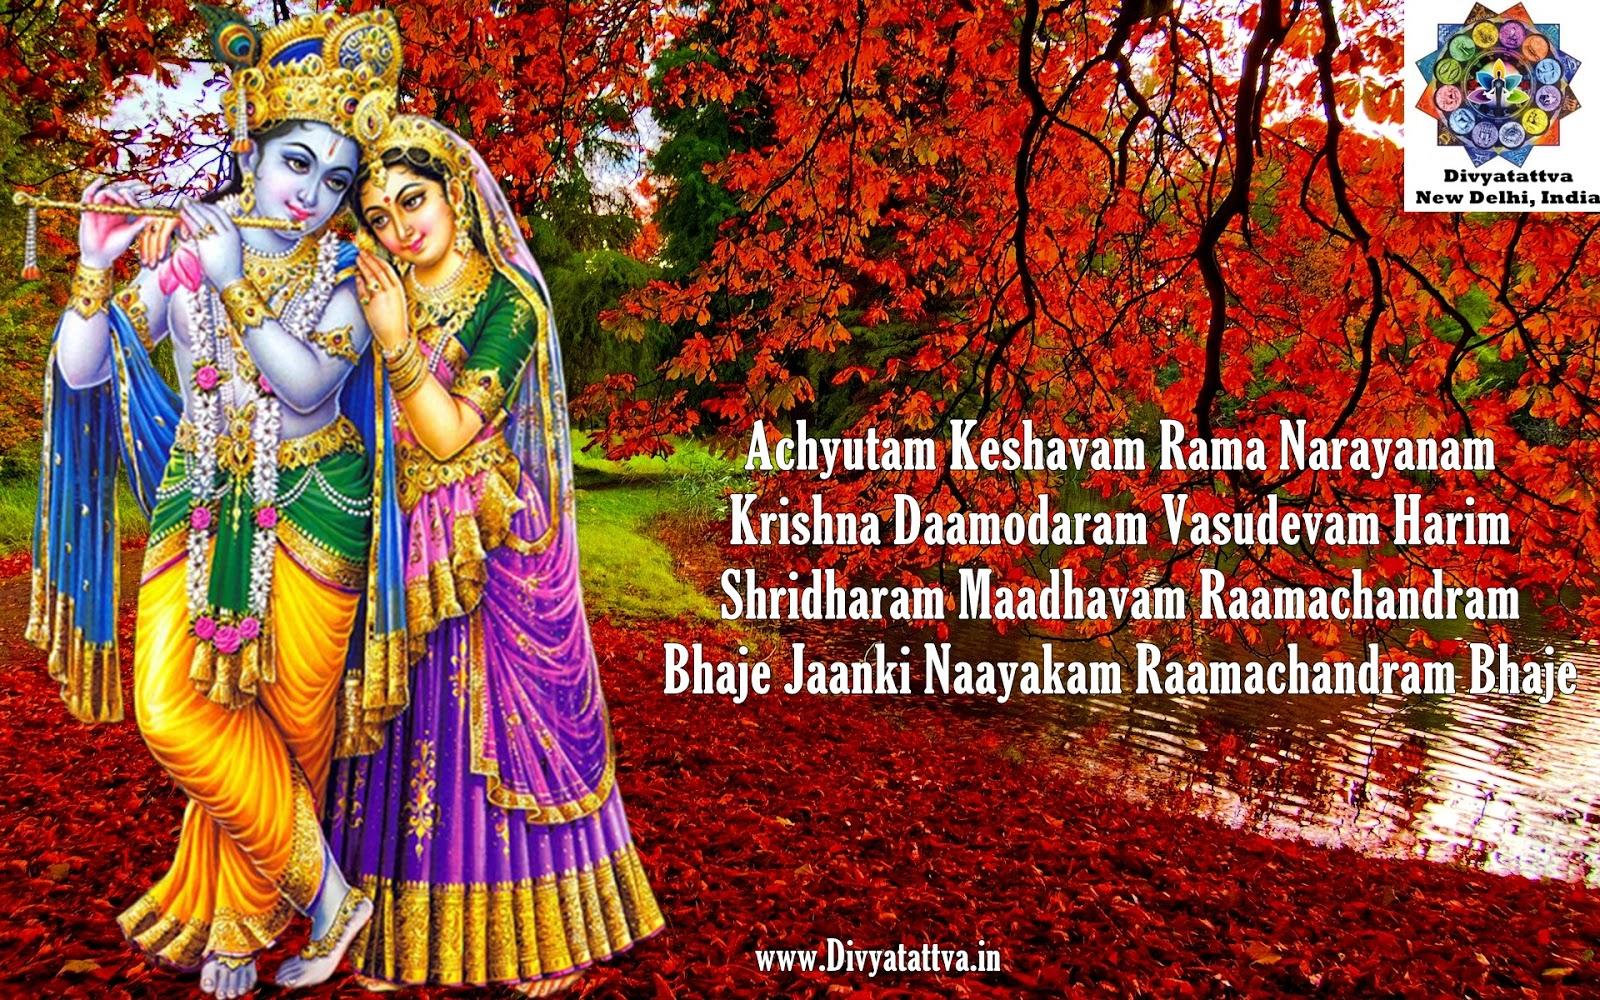 radha krishna images download radha krishna hd wallpapers santabanta hd wallpapers 4k download 1600x1000 download hd wallpaper wallpapertip santabanta hd wallpapers 4k download